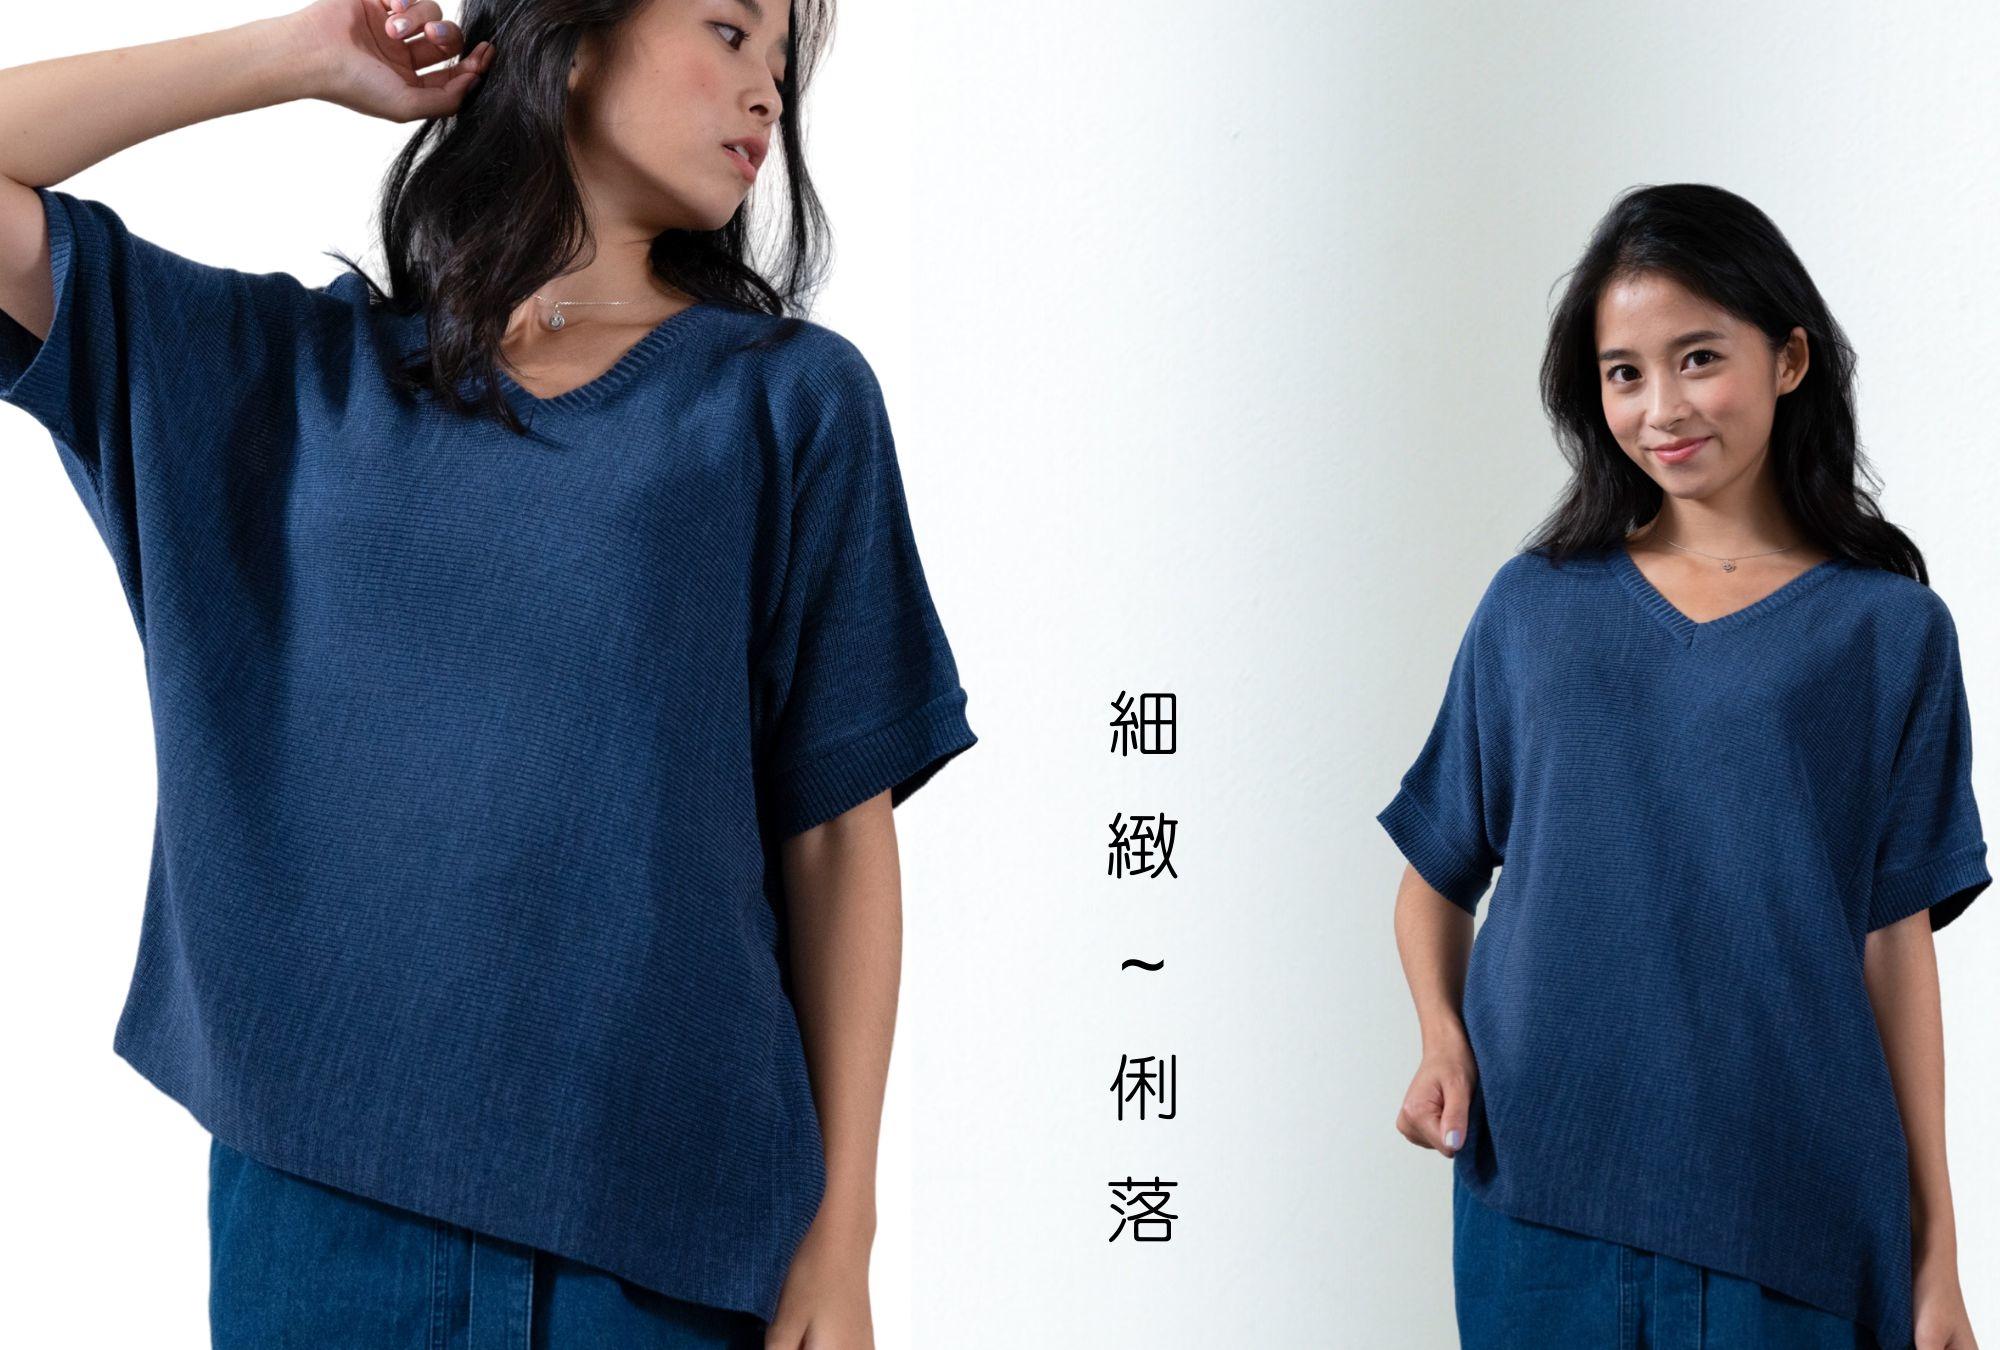 V領細針針織衫~下擺不規則設計的MIT針織上衣